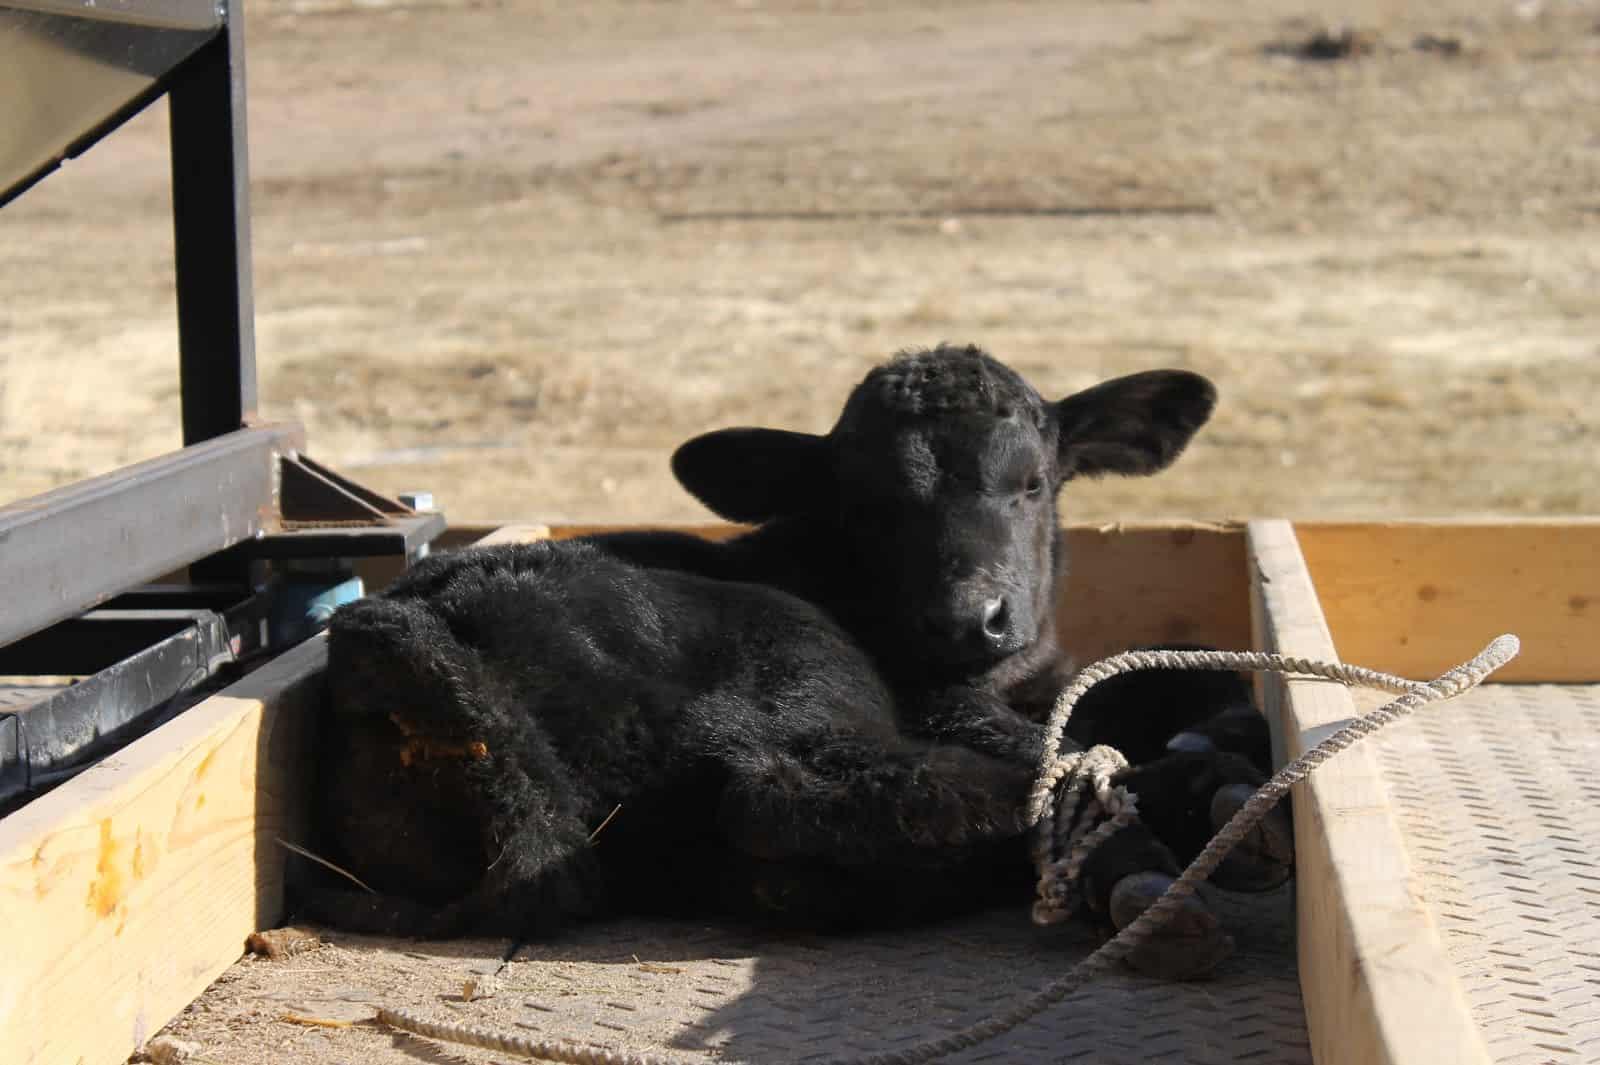 black Angus calf in pickup bed